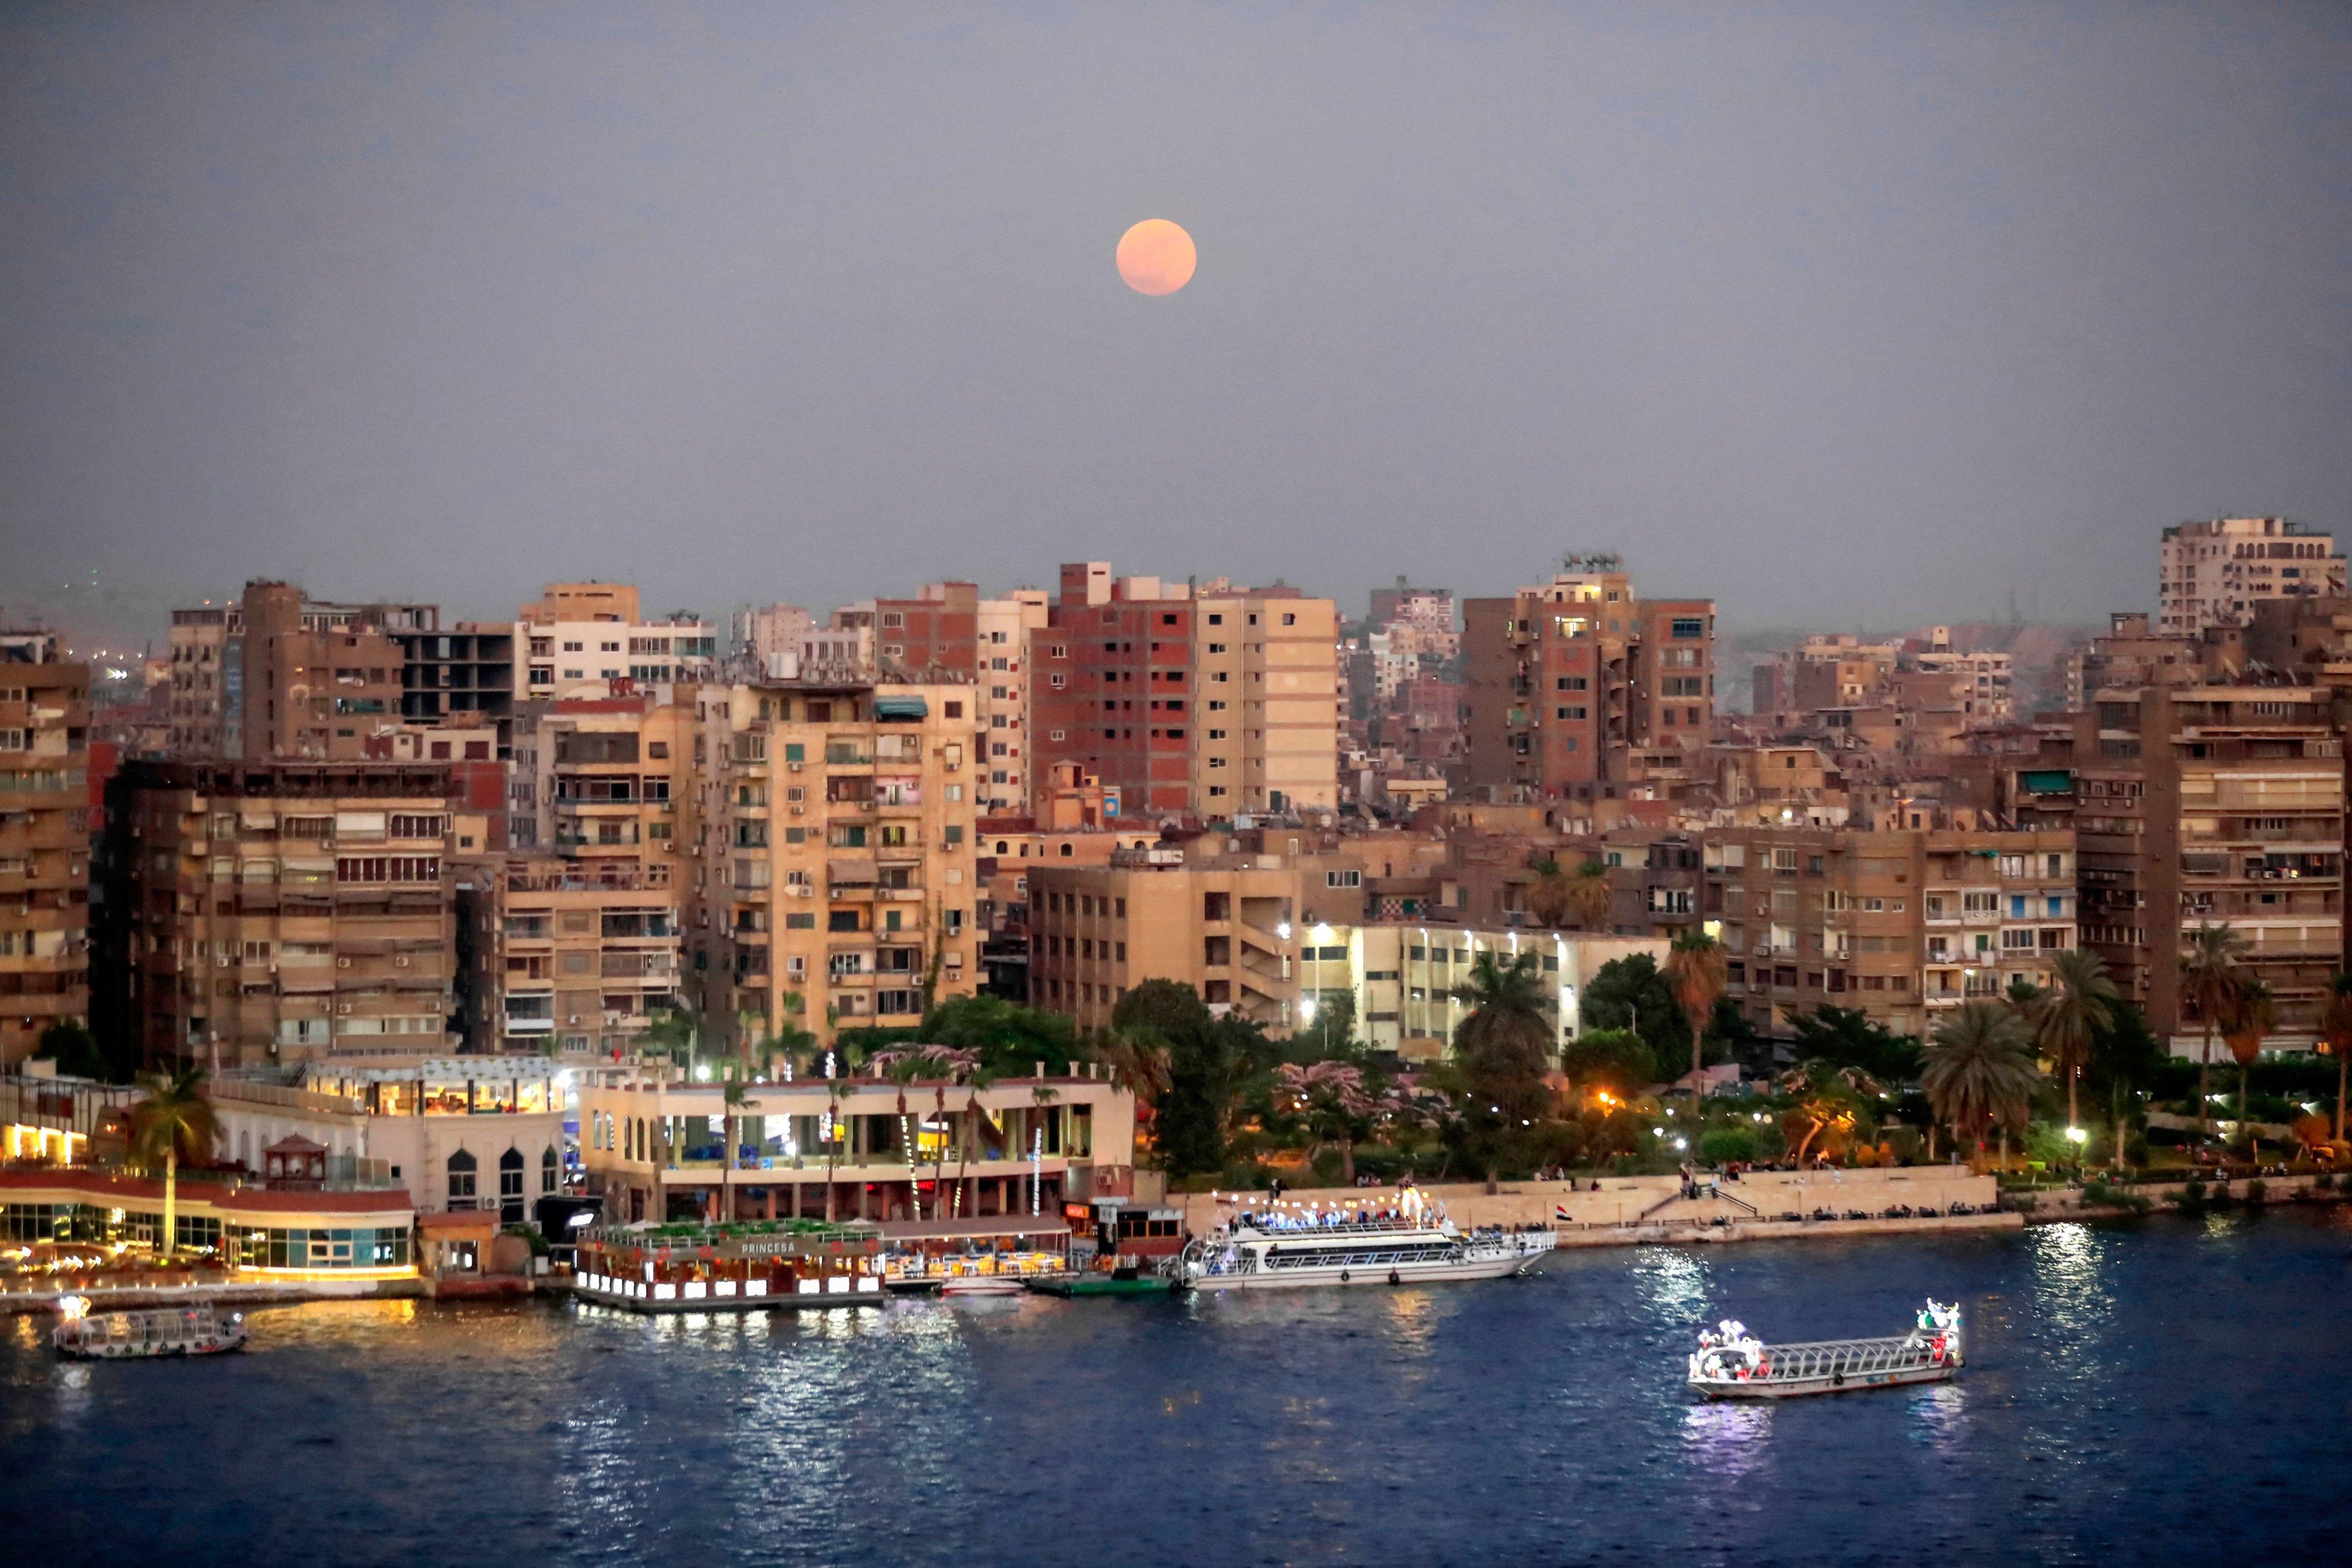 EGYPT-ASTRONOMY-MOON